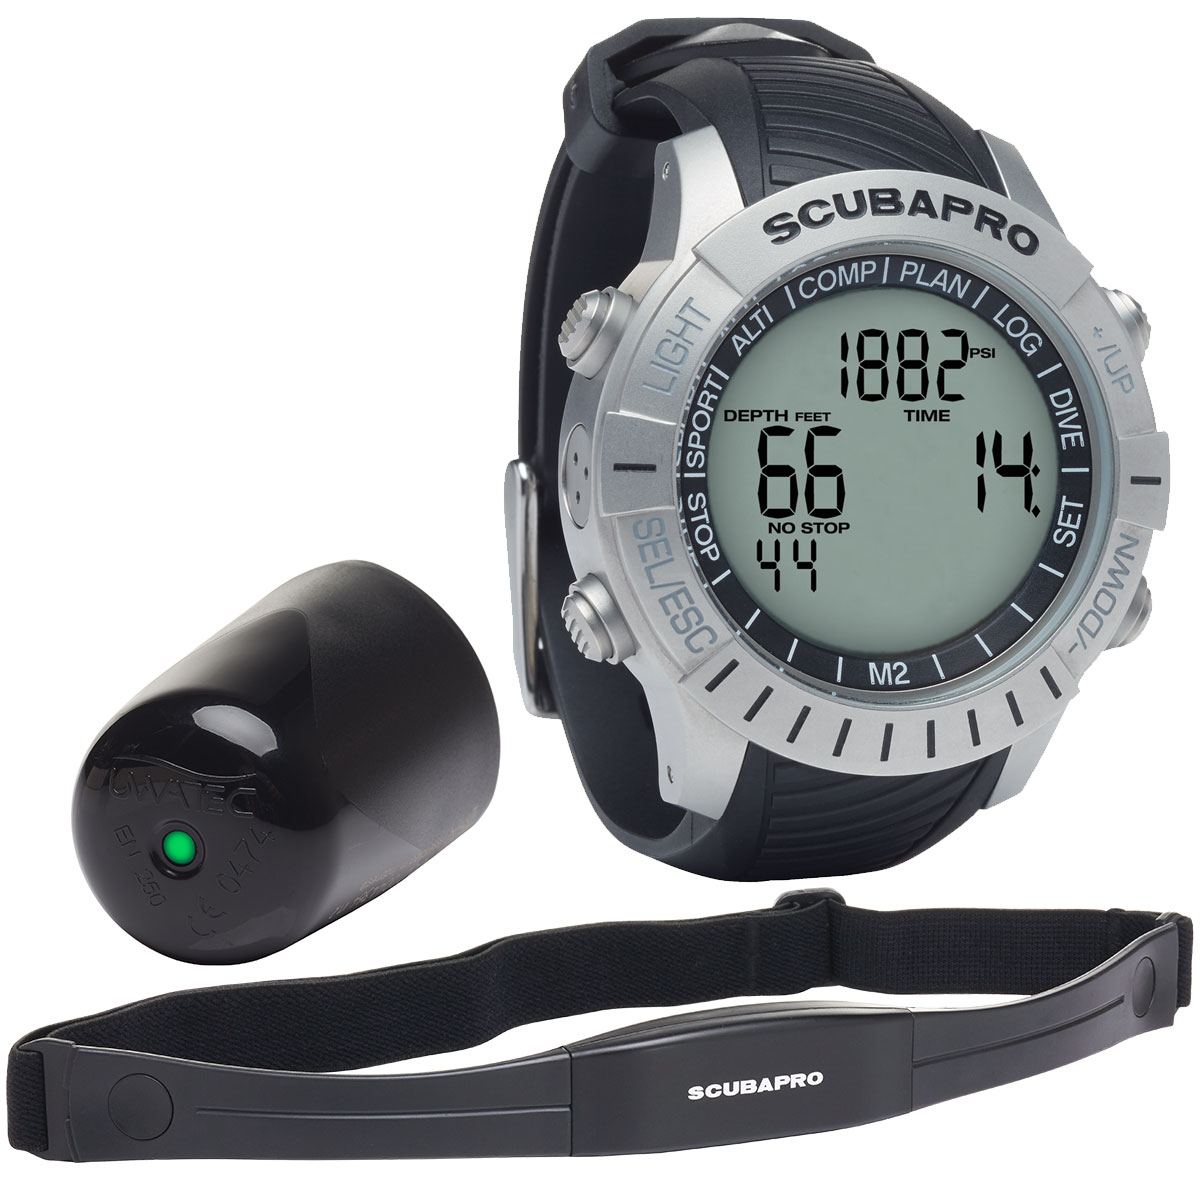 ScubaPro M2 Mantis 2.0 Triple-Gas Human-Factor Watch-Style Hoseless Air-Integrated Wrist Dive Computer